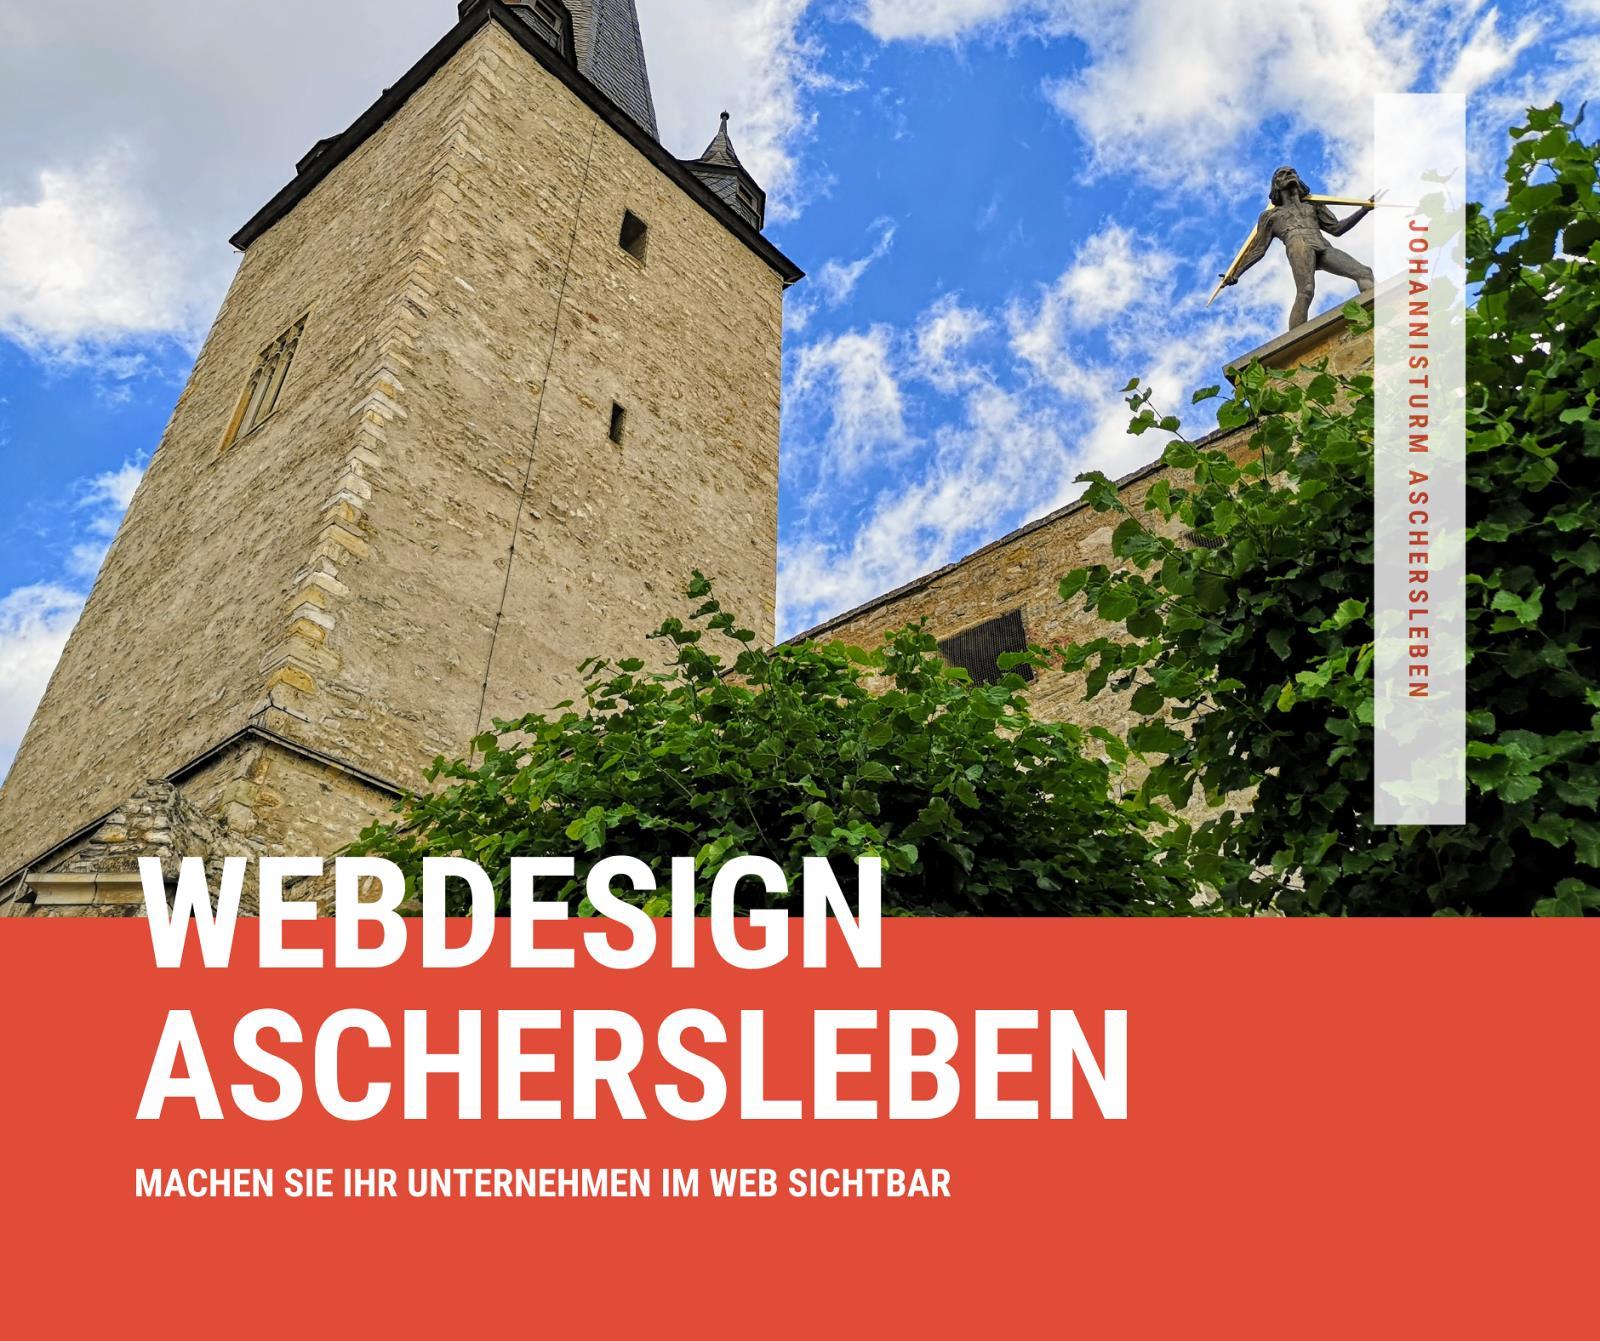 Webdesign Aschersleben